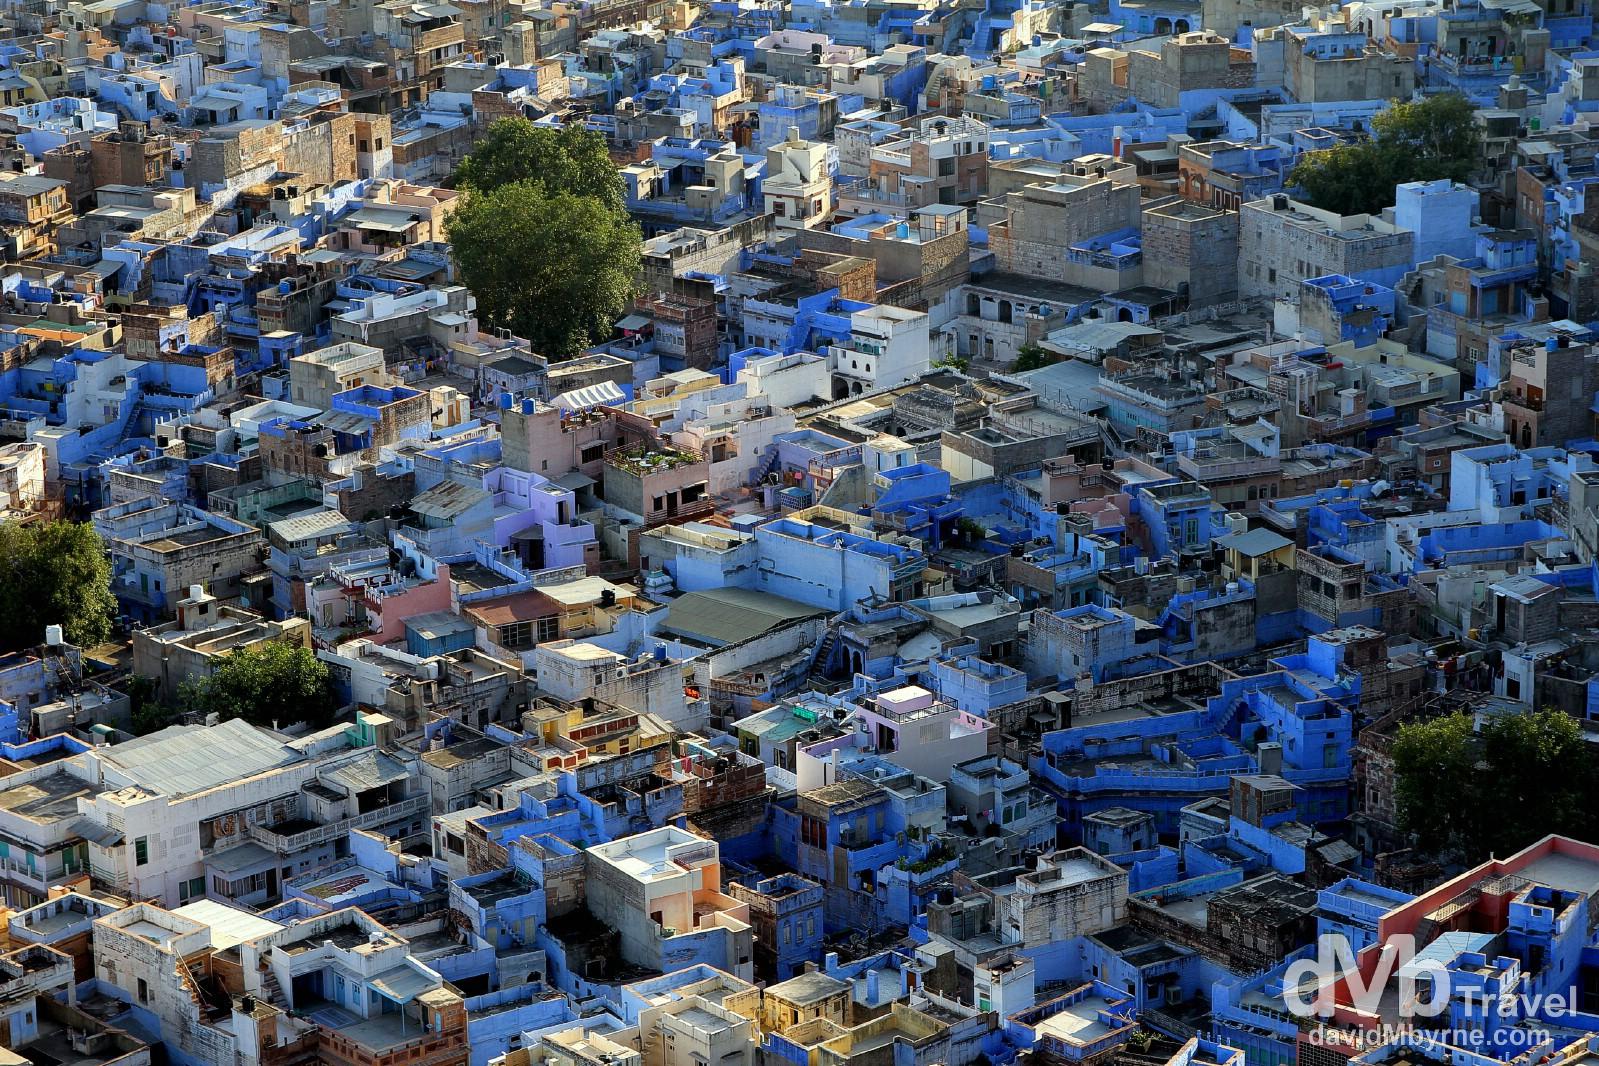 Jodhpur, The Blue City, as seen from the walls of Mehrangarh Fort. Jodhpur, Rajasthan, India. October 6th 2012.